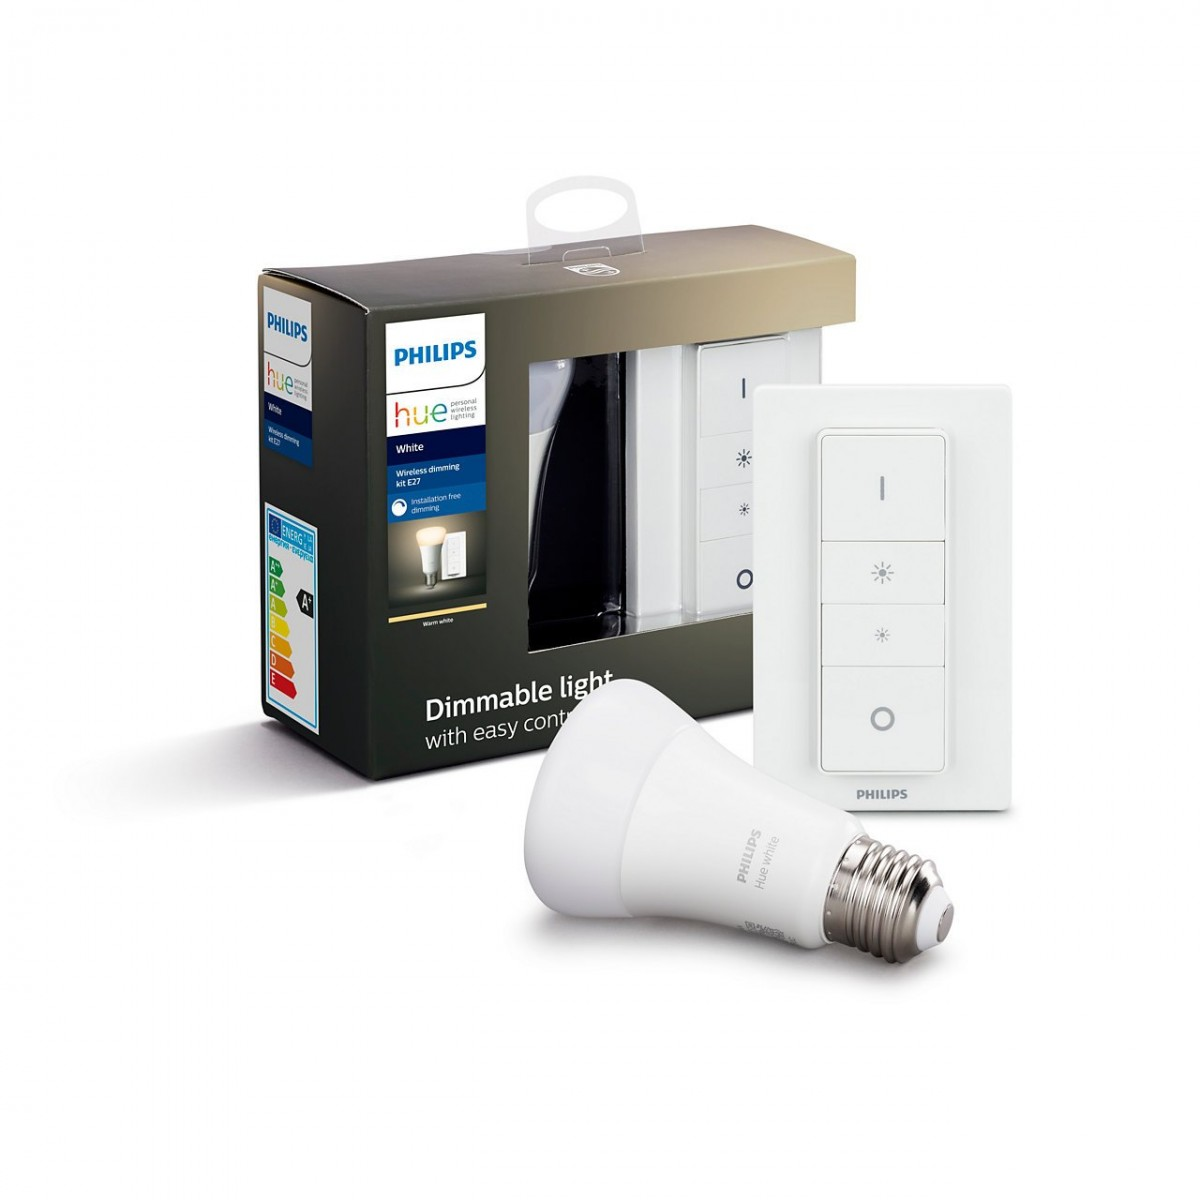 Philips Hue 8718696785331 Starter kit LED žárovka + ovladač Dimmer Switch 1x9W|E27 - Bluetooth, White Philips Hue E27 W 9,5W BT + vypínač